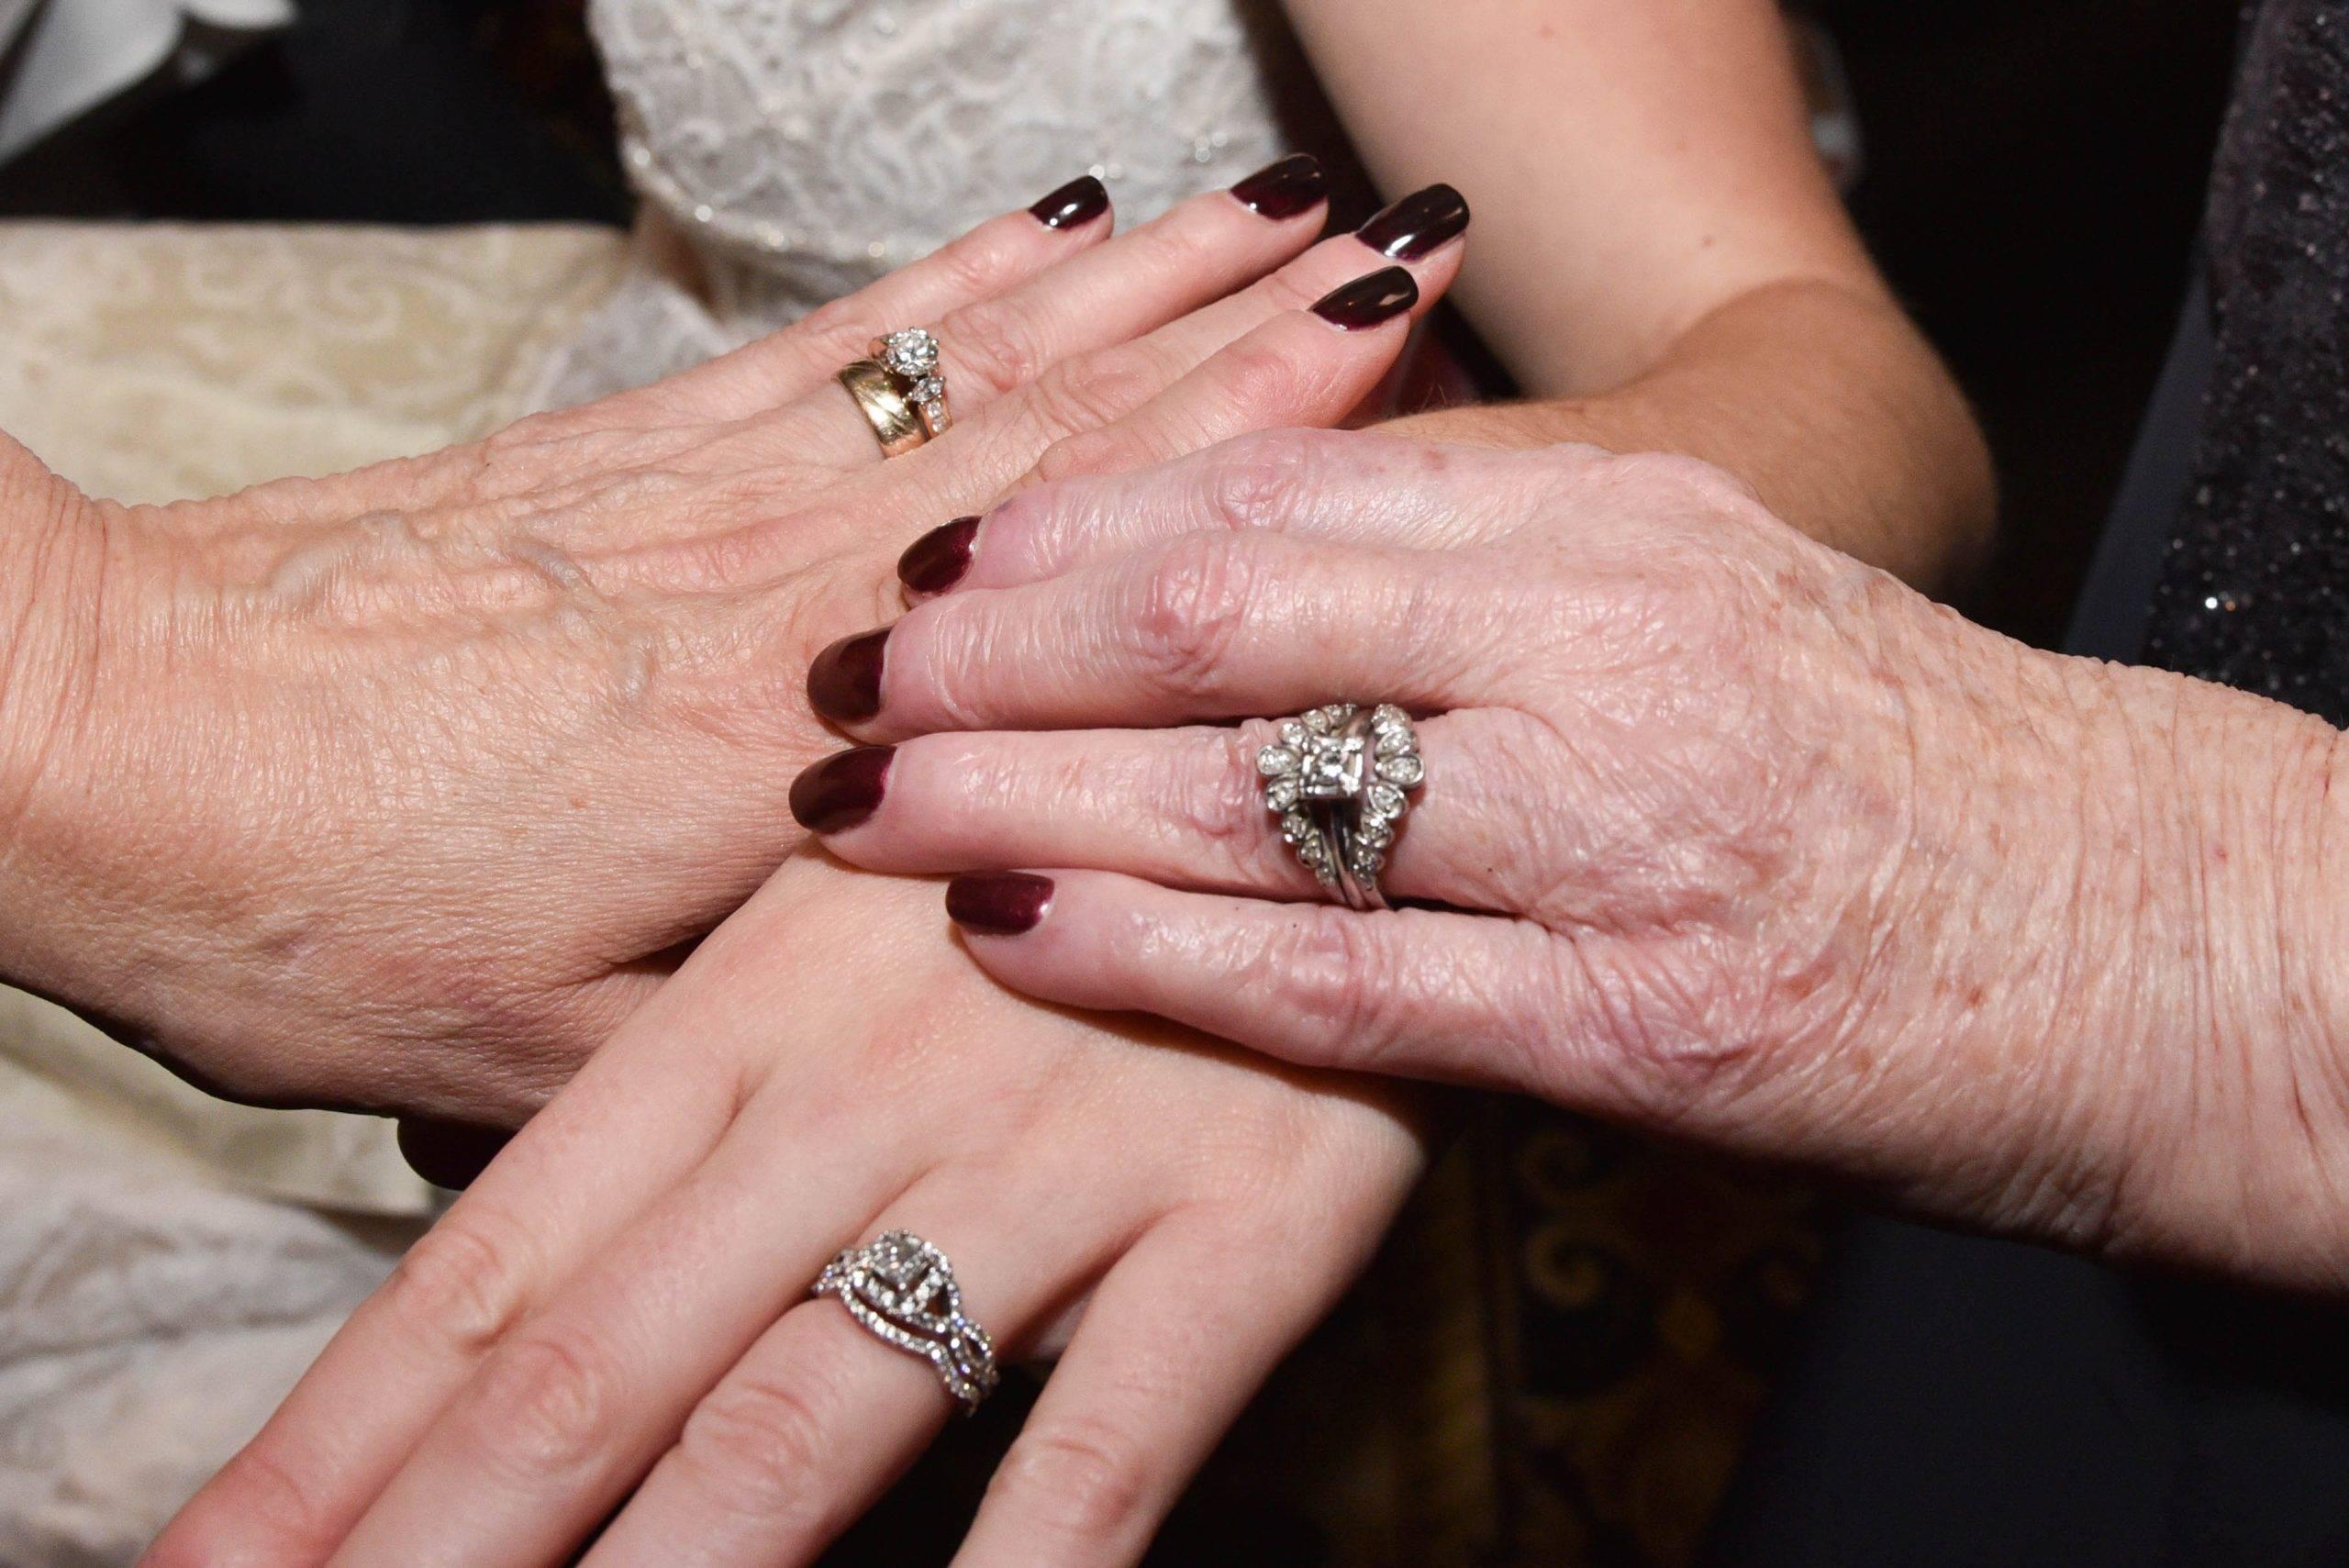 Birchwood Manor rings